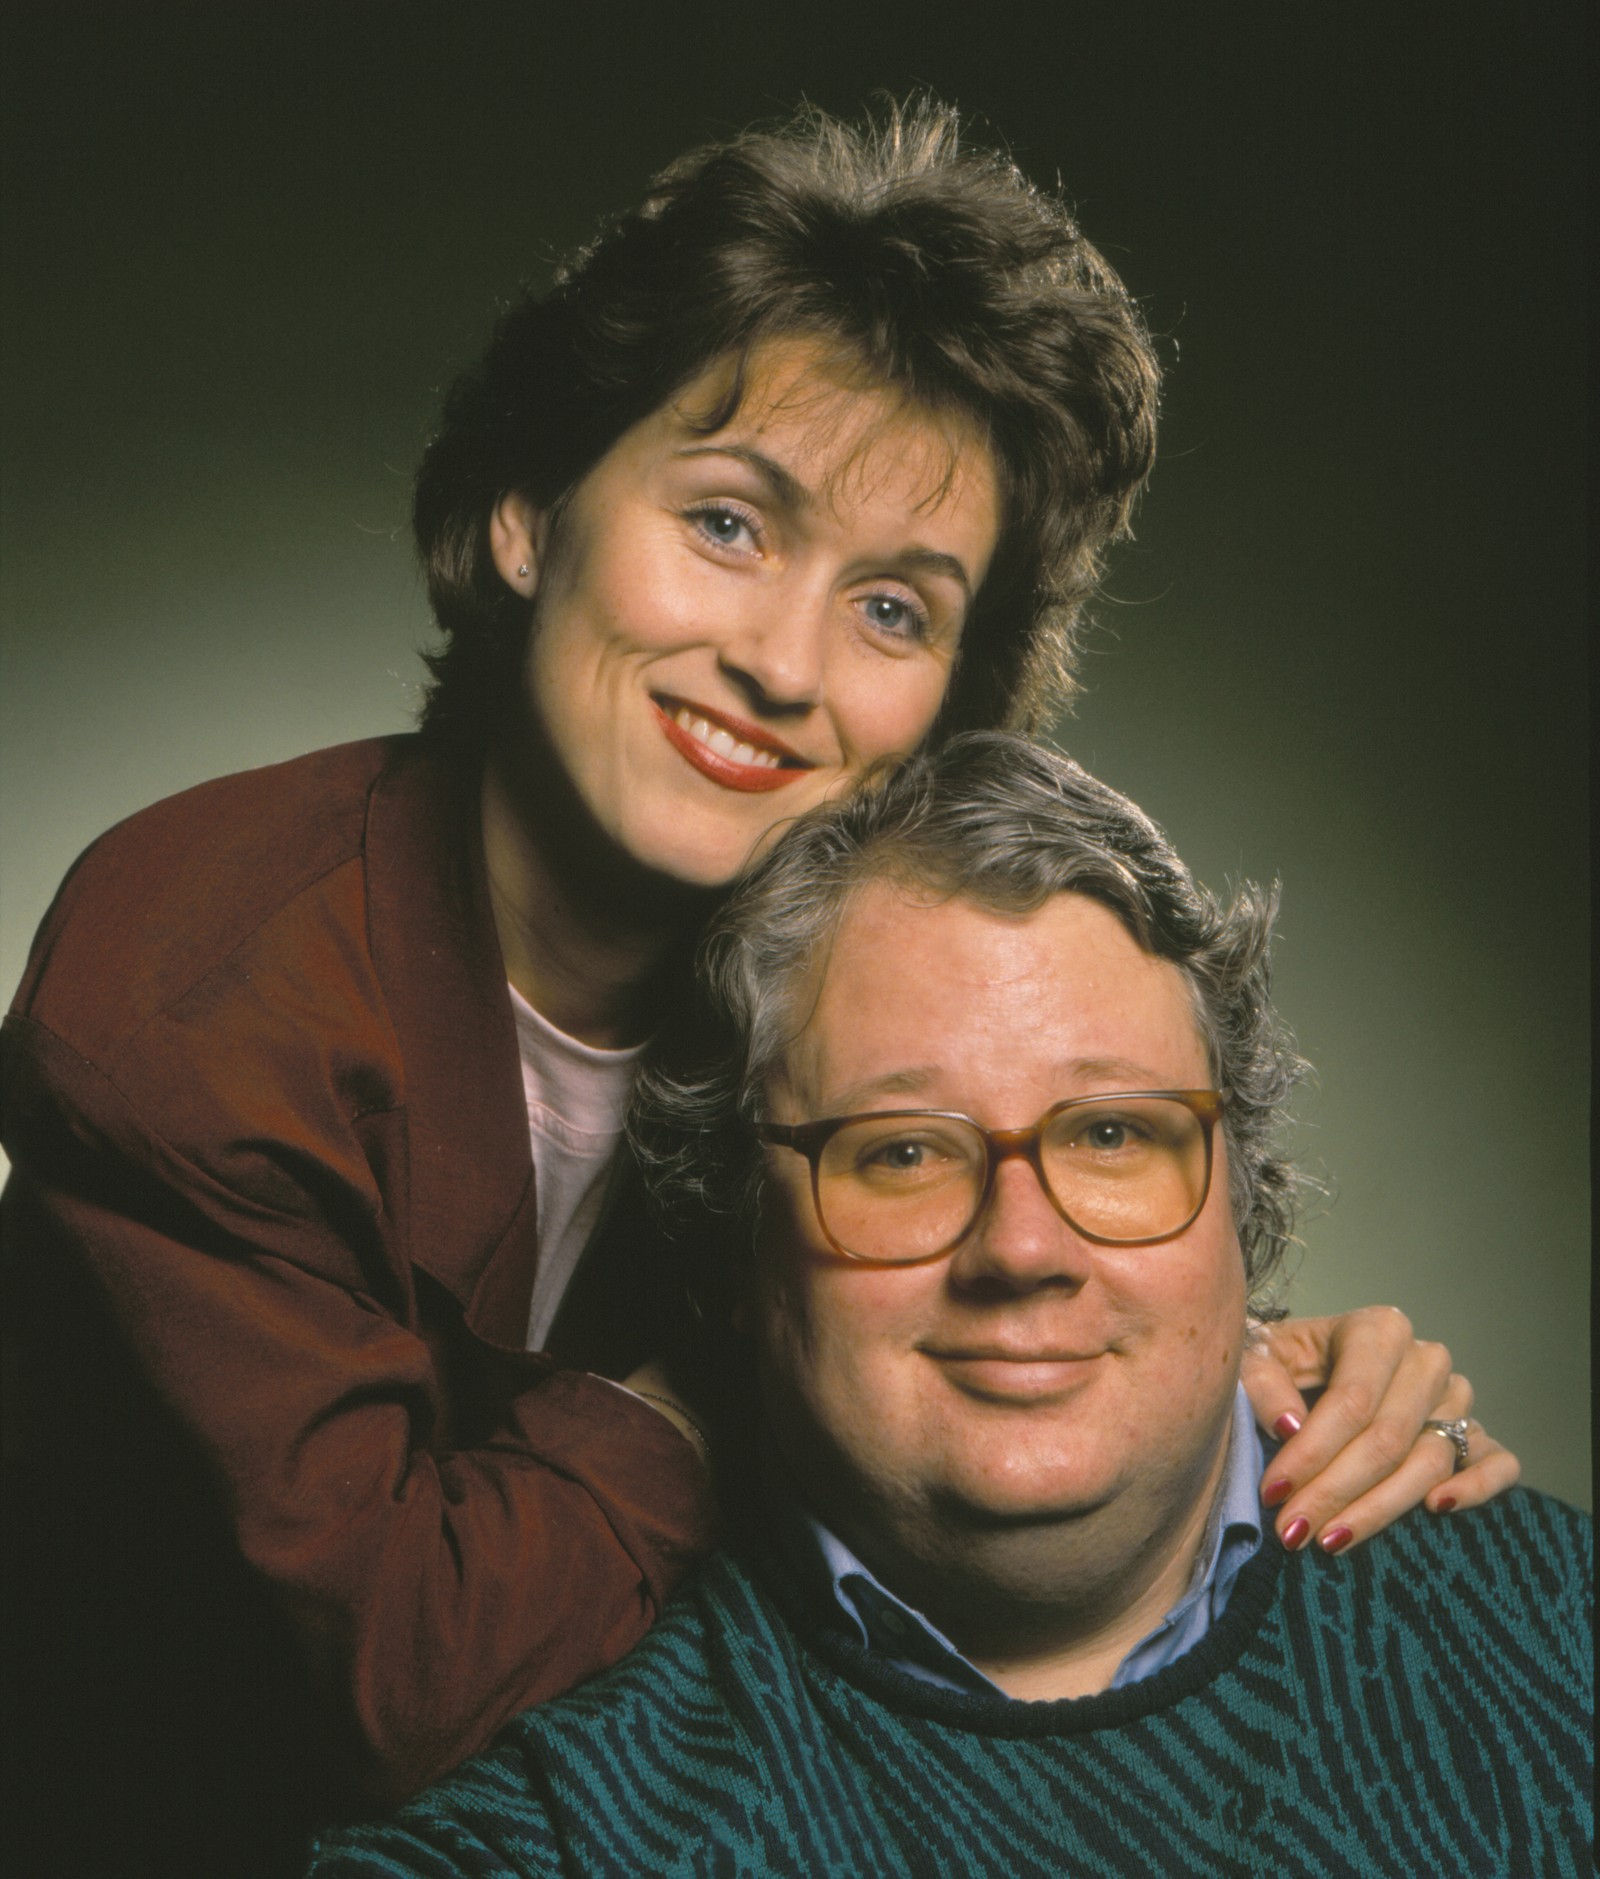 Lørdagsrariete med Borge, Hummel og kanari 1990